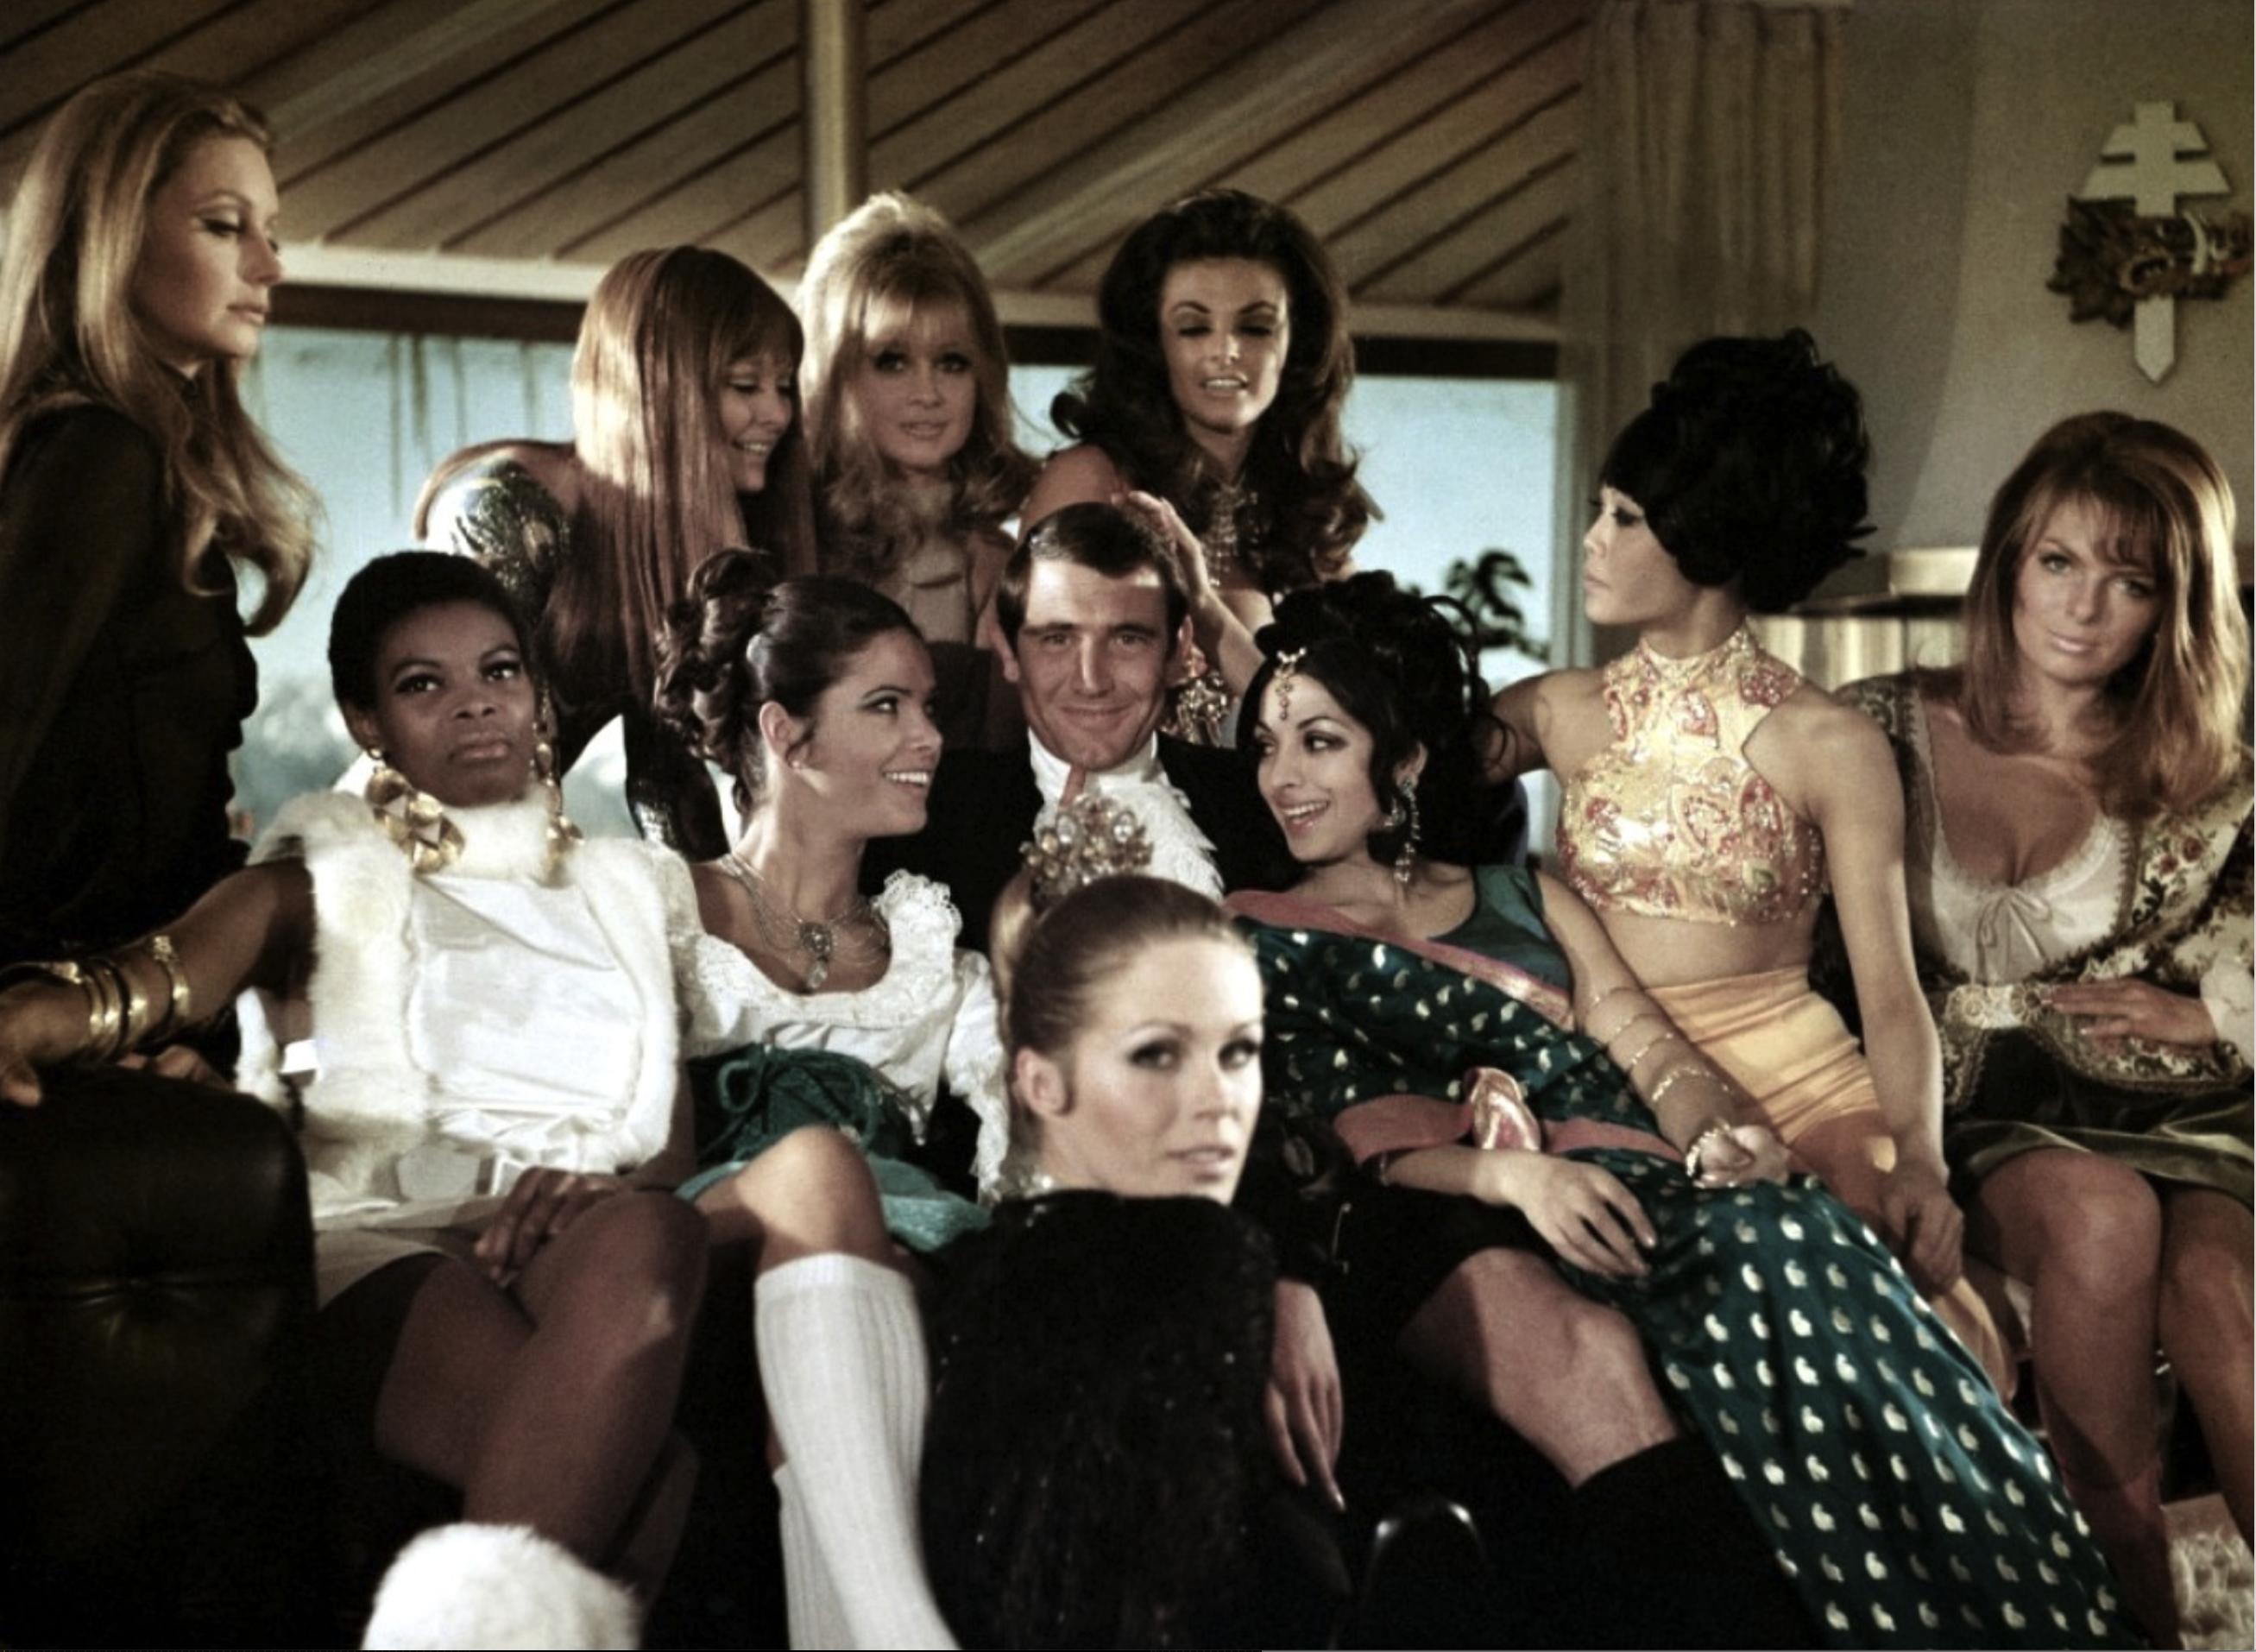 Doalfe/Blofeld's Angels of Death (On Her Majesty's Secret Service)